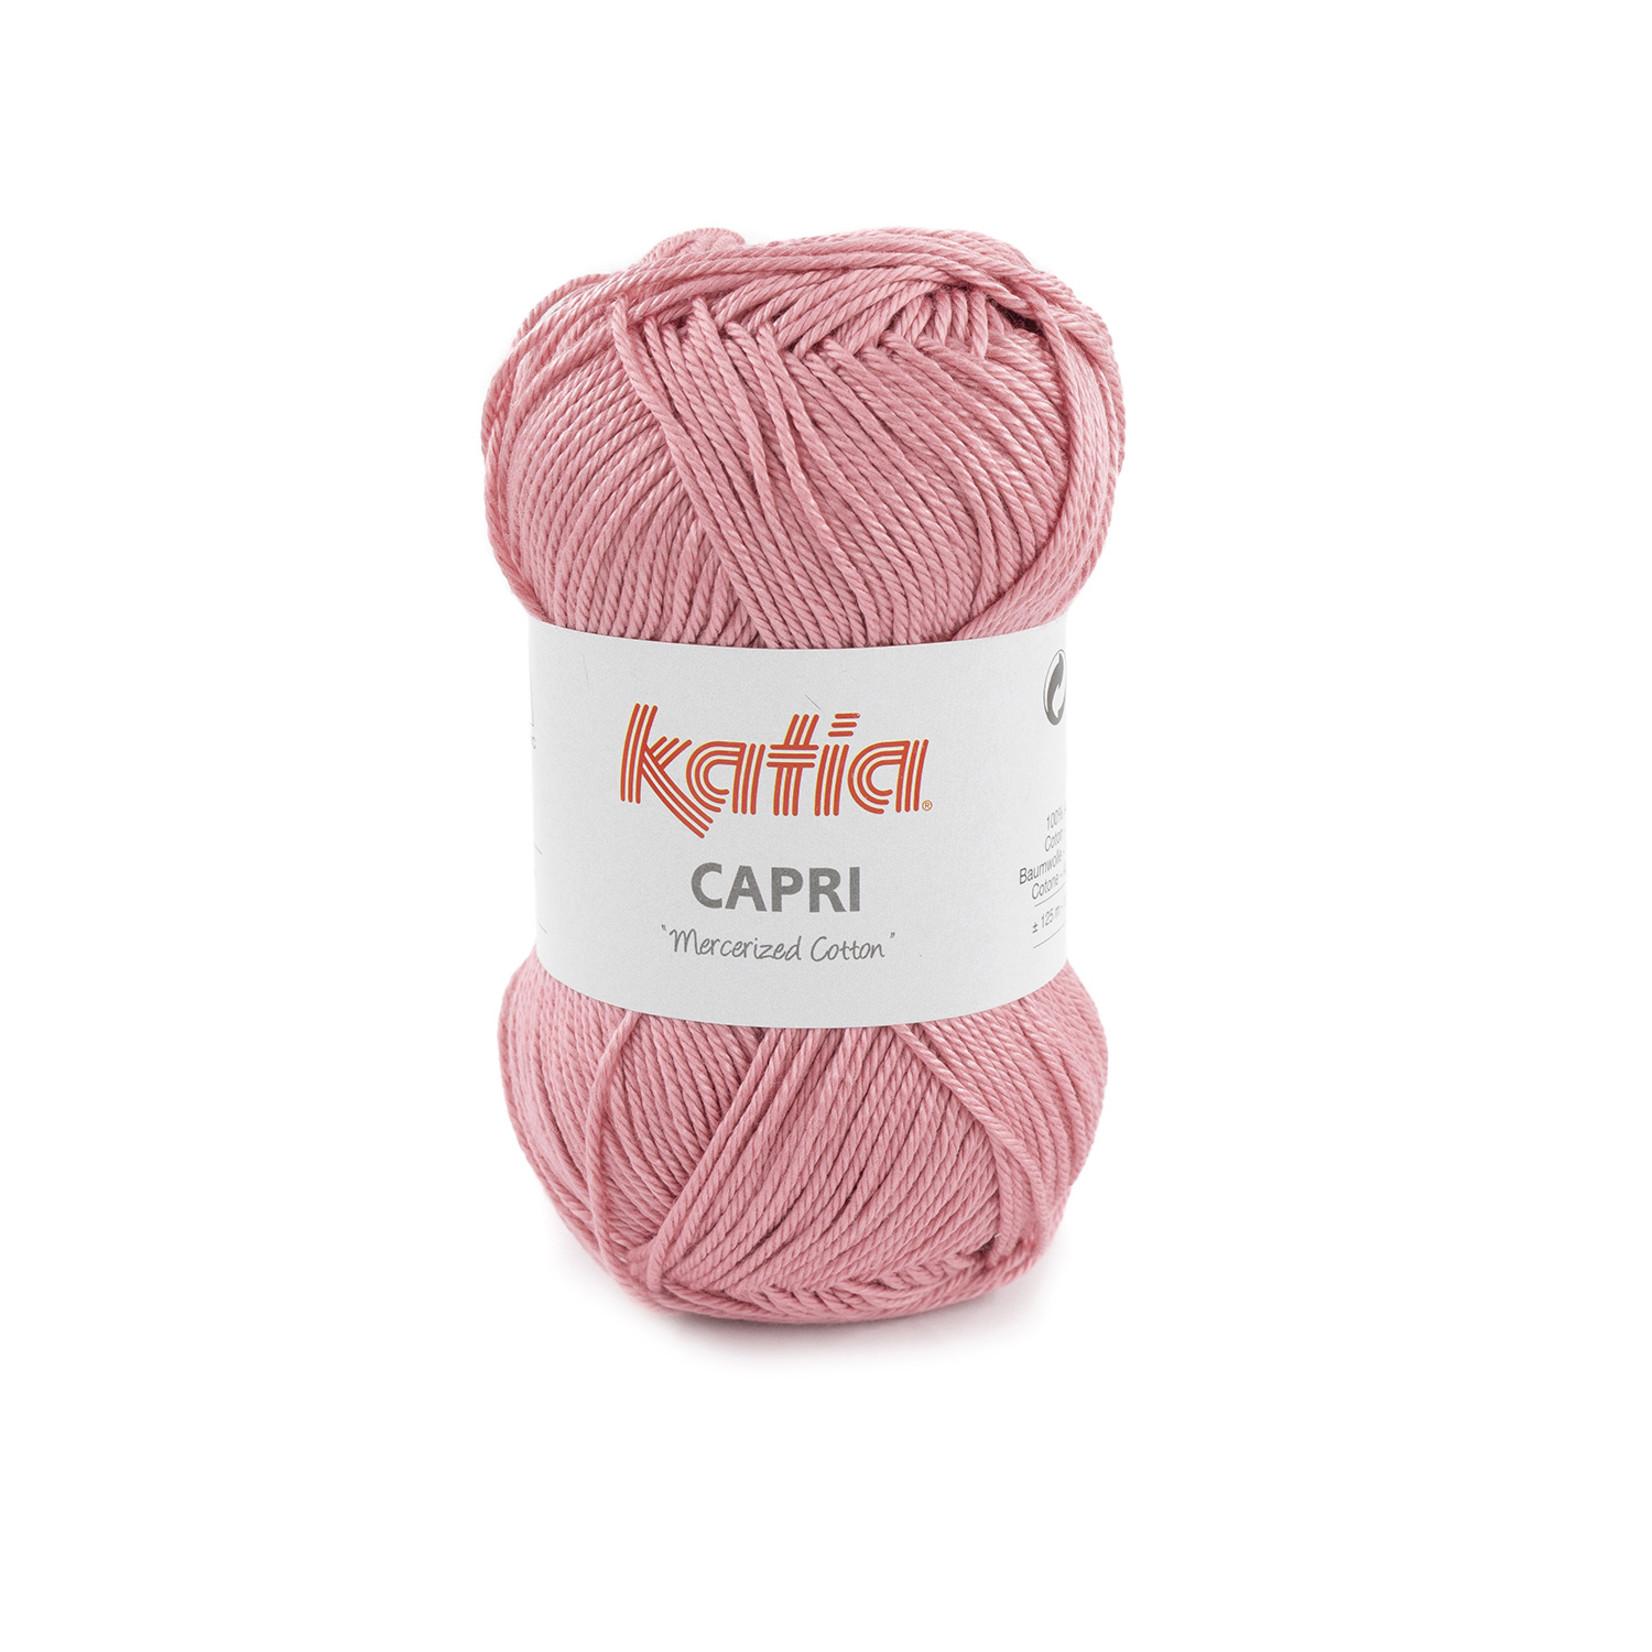 Katia Katia Capri - kleur 183 onbekend - 50 gr. = 125 m. - 100% katoen